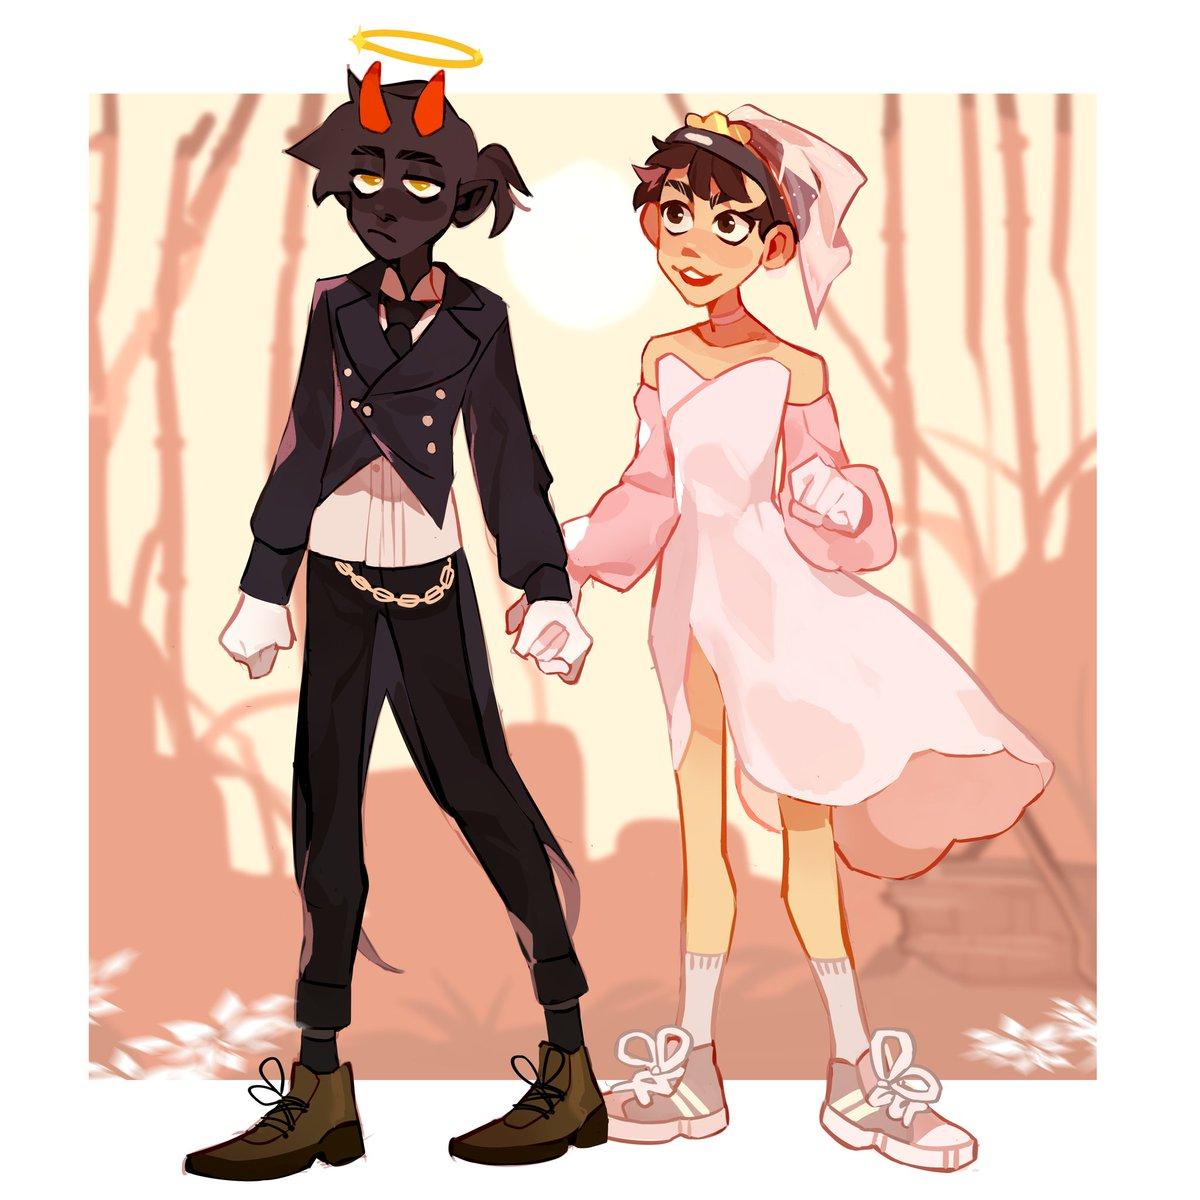 butlerboyhalo and princess quackity are so pwetty UwU #badboyhalofanart #DreamTeam #dreamsmp #bbhfanart #quackitysupport #quackityfanart